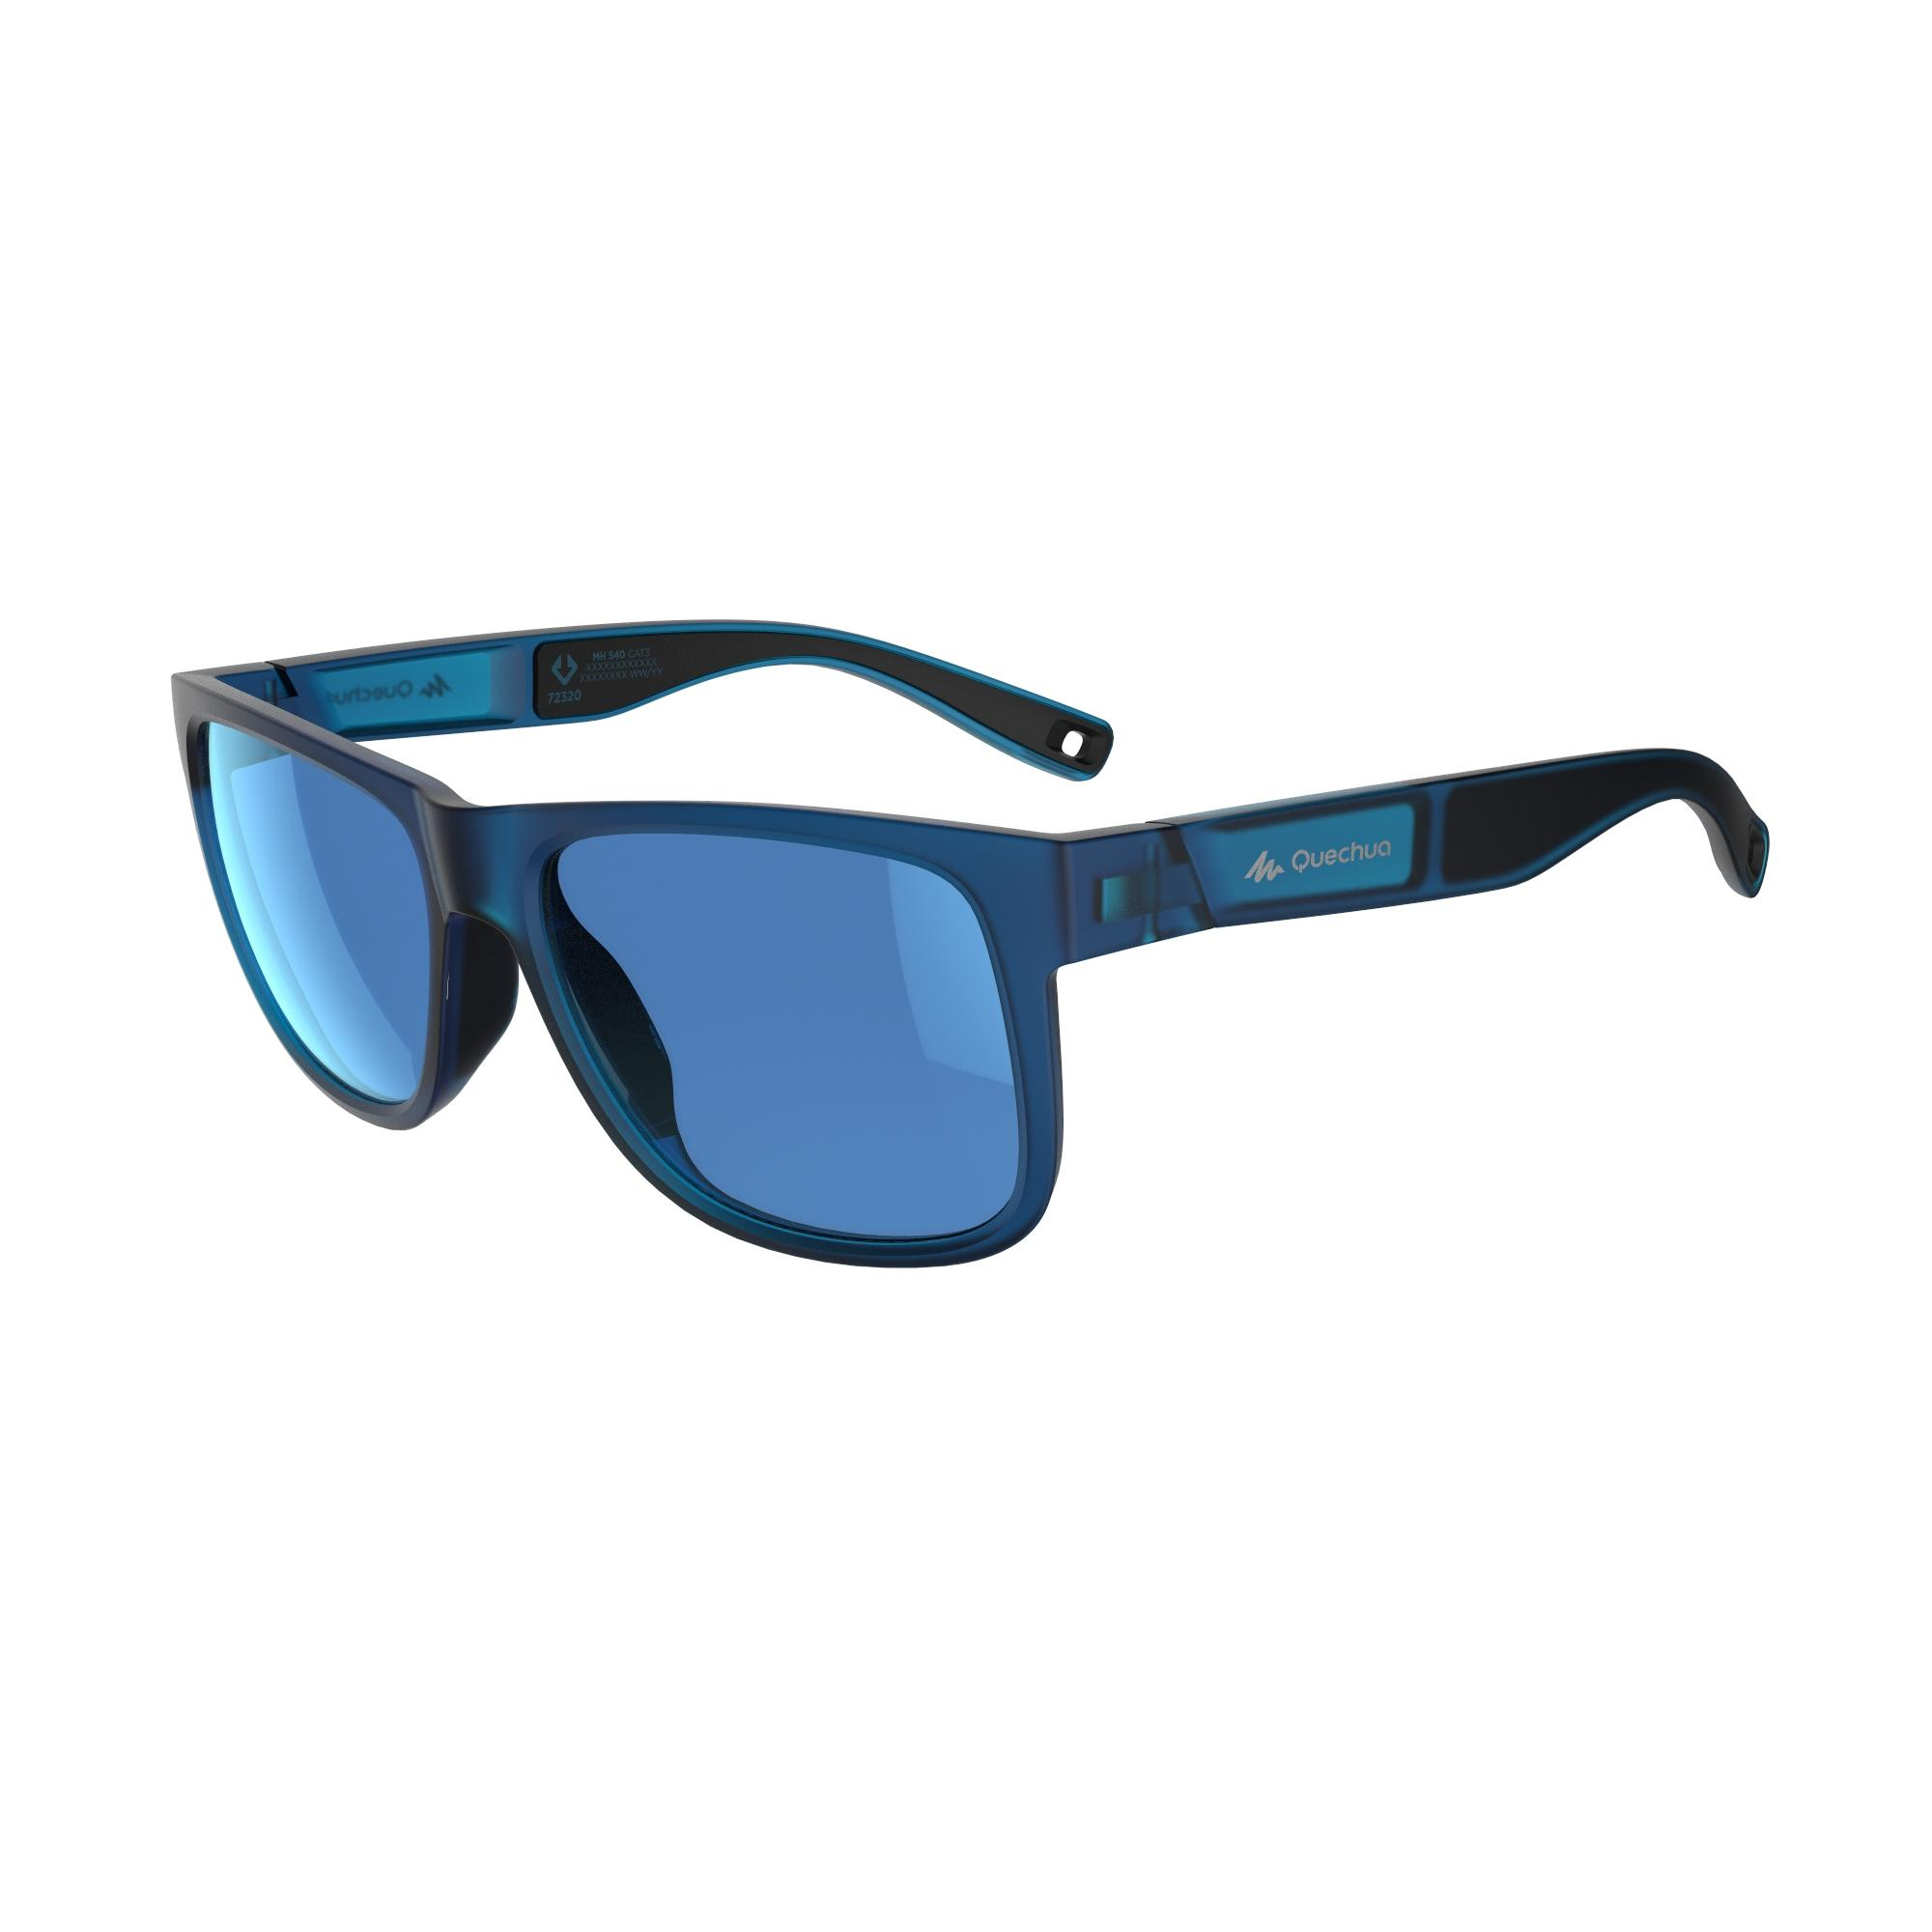 Lentes de sol senderismo adulto MH 540 azul. Categoría 3